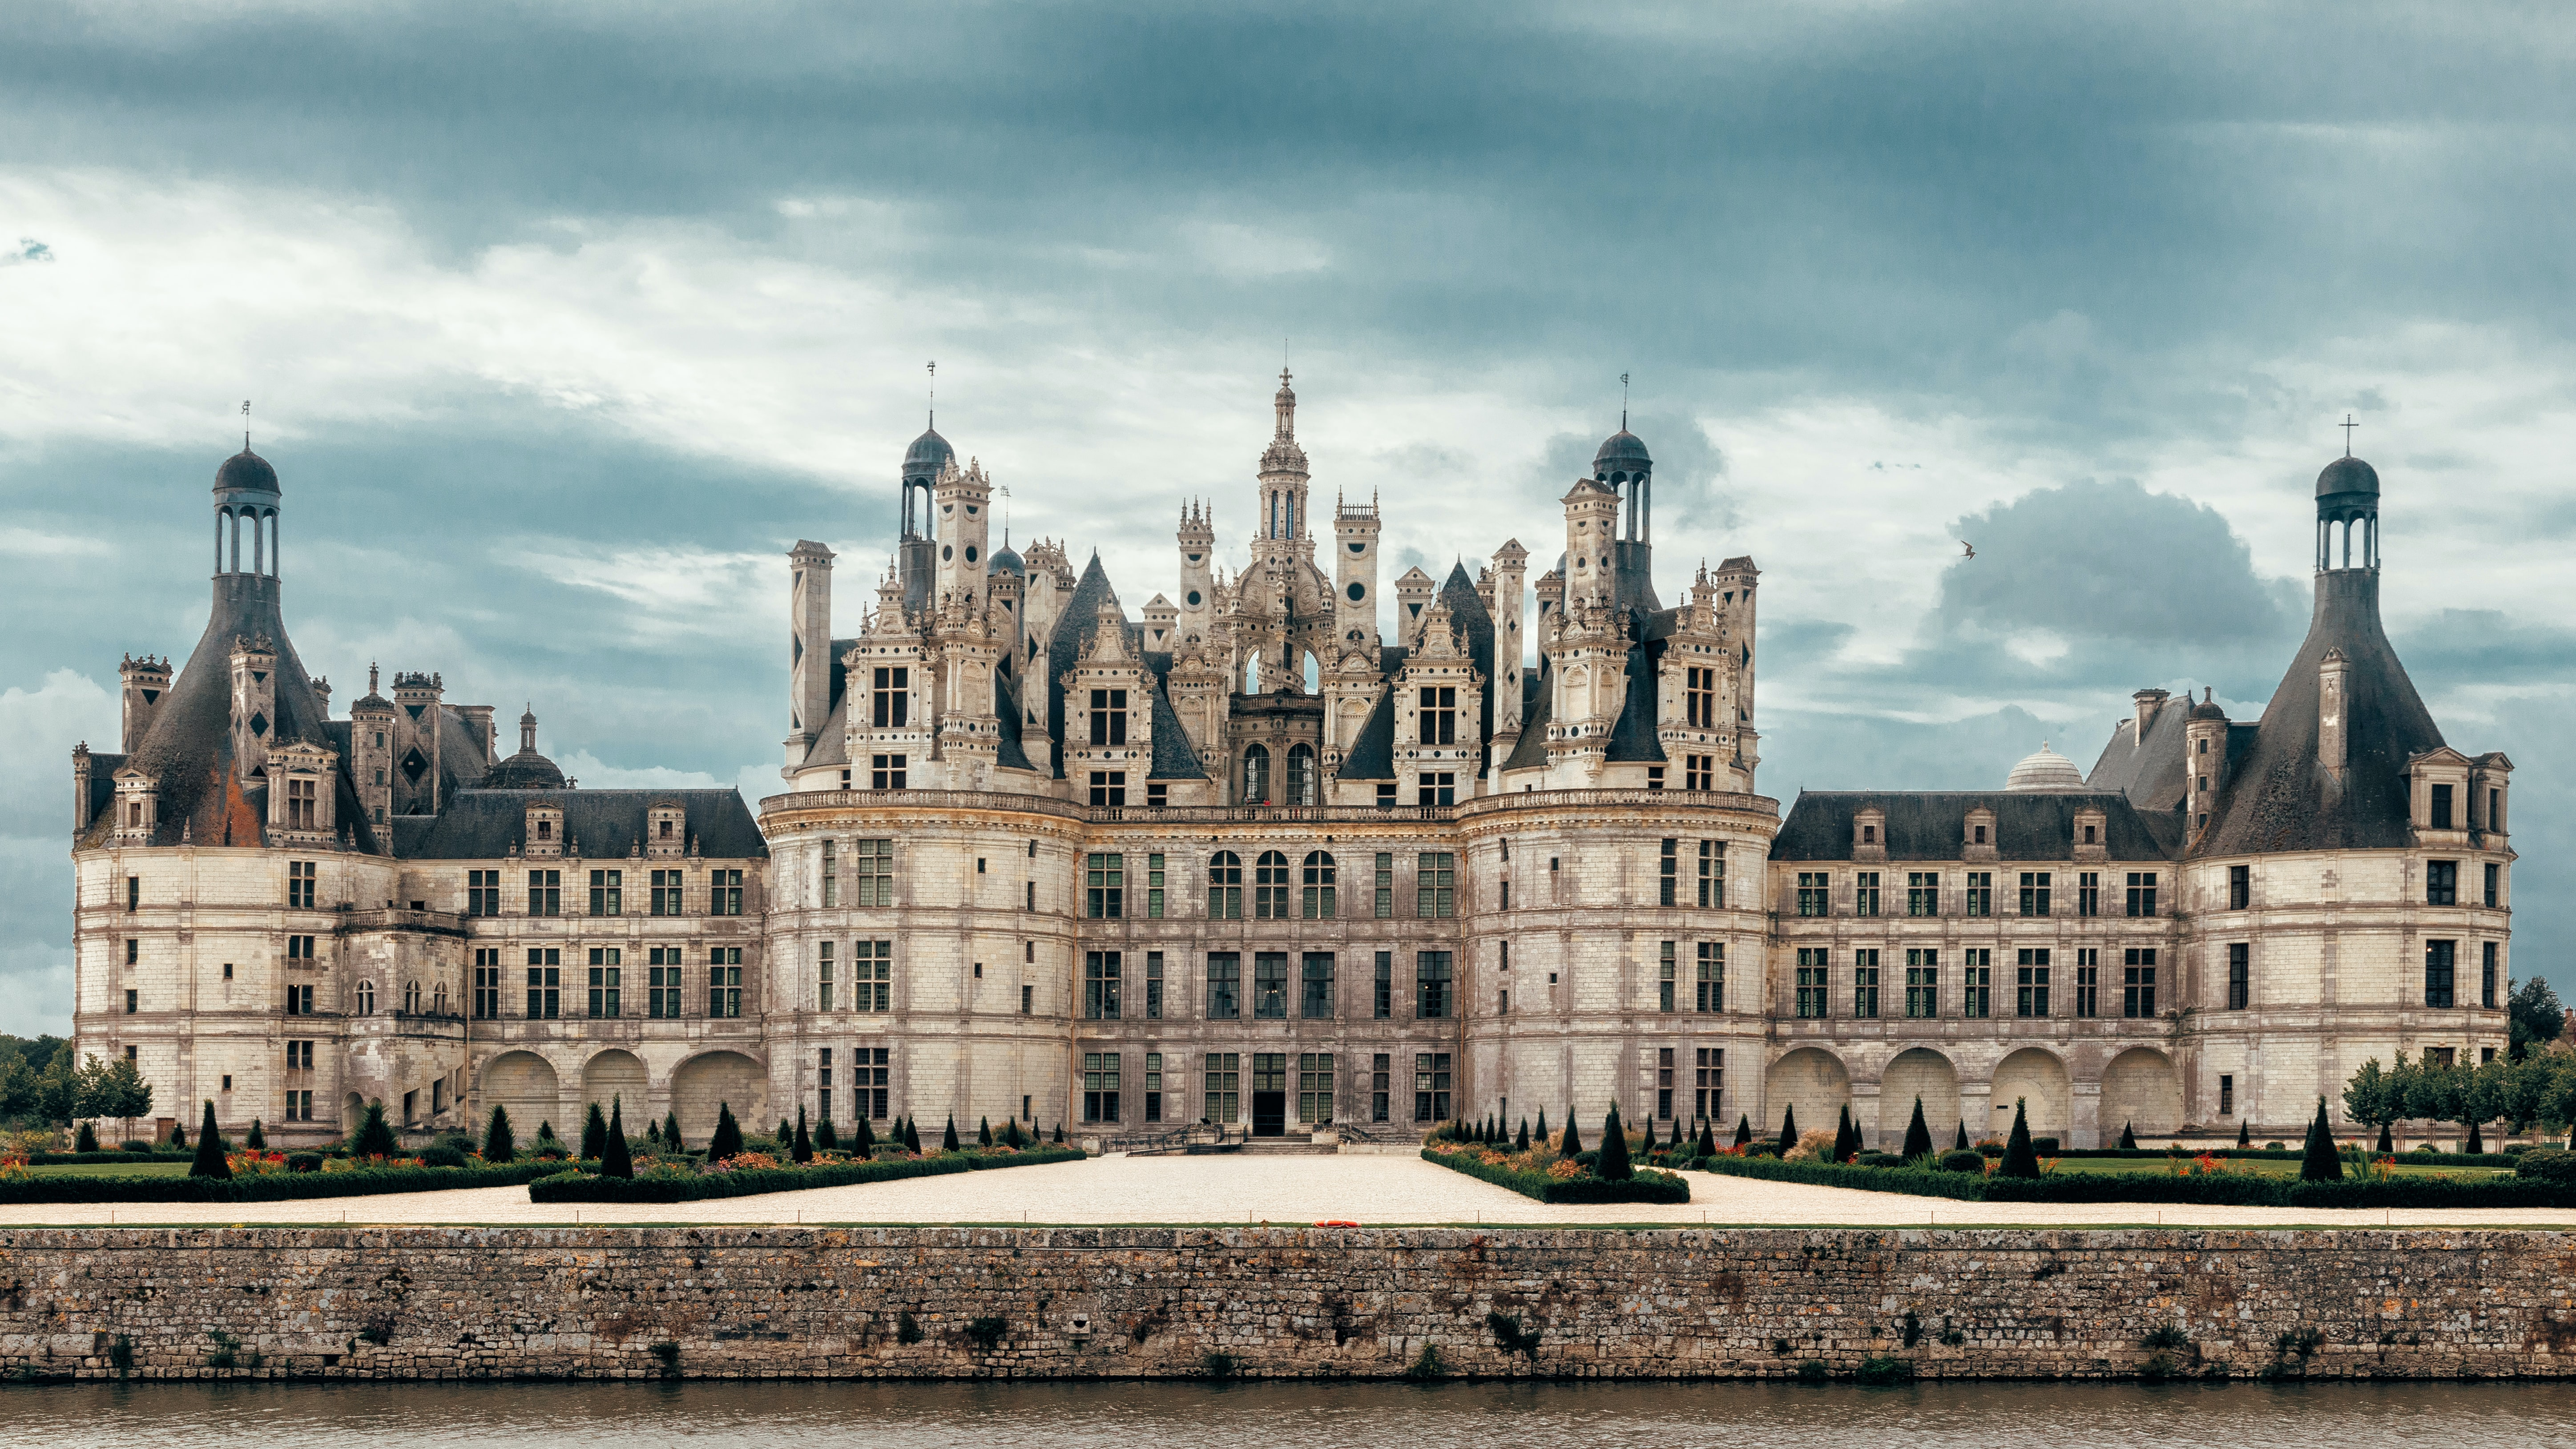 Reasons to visit France